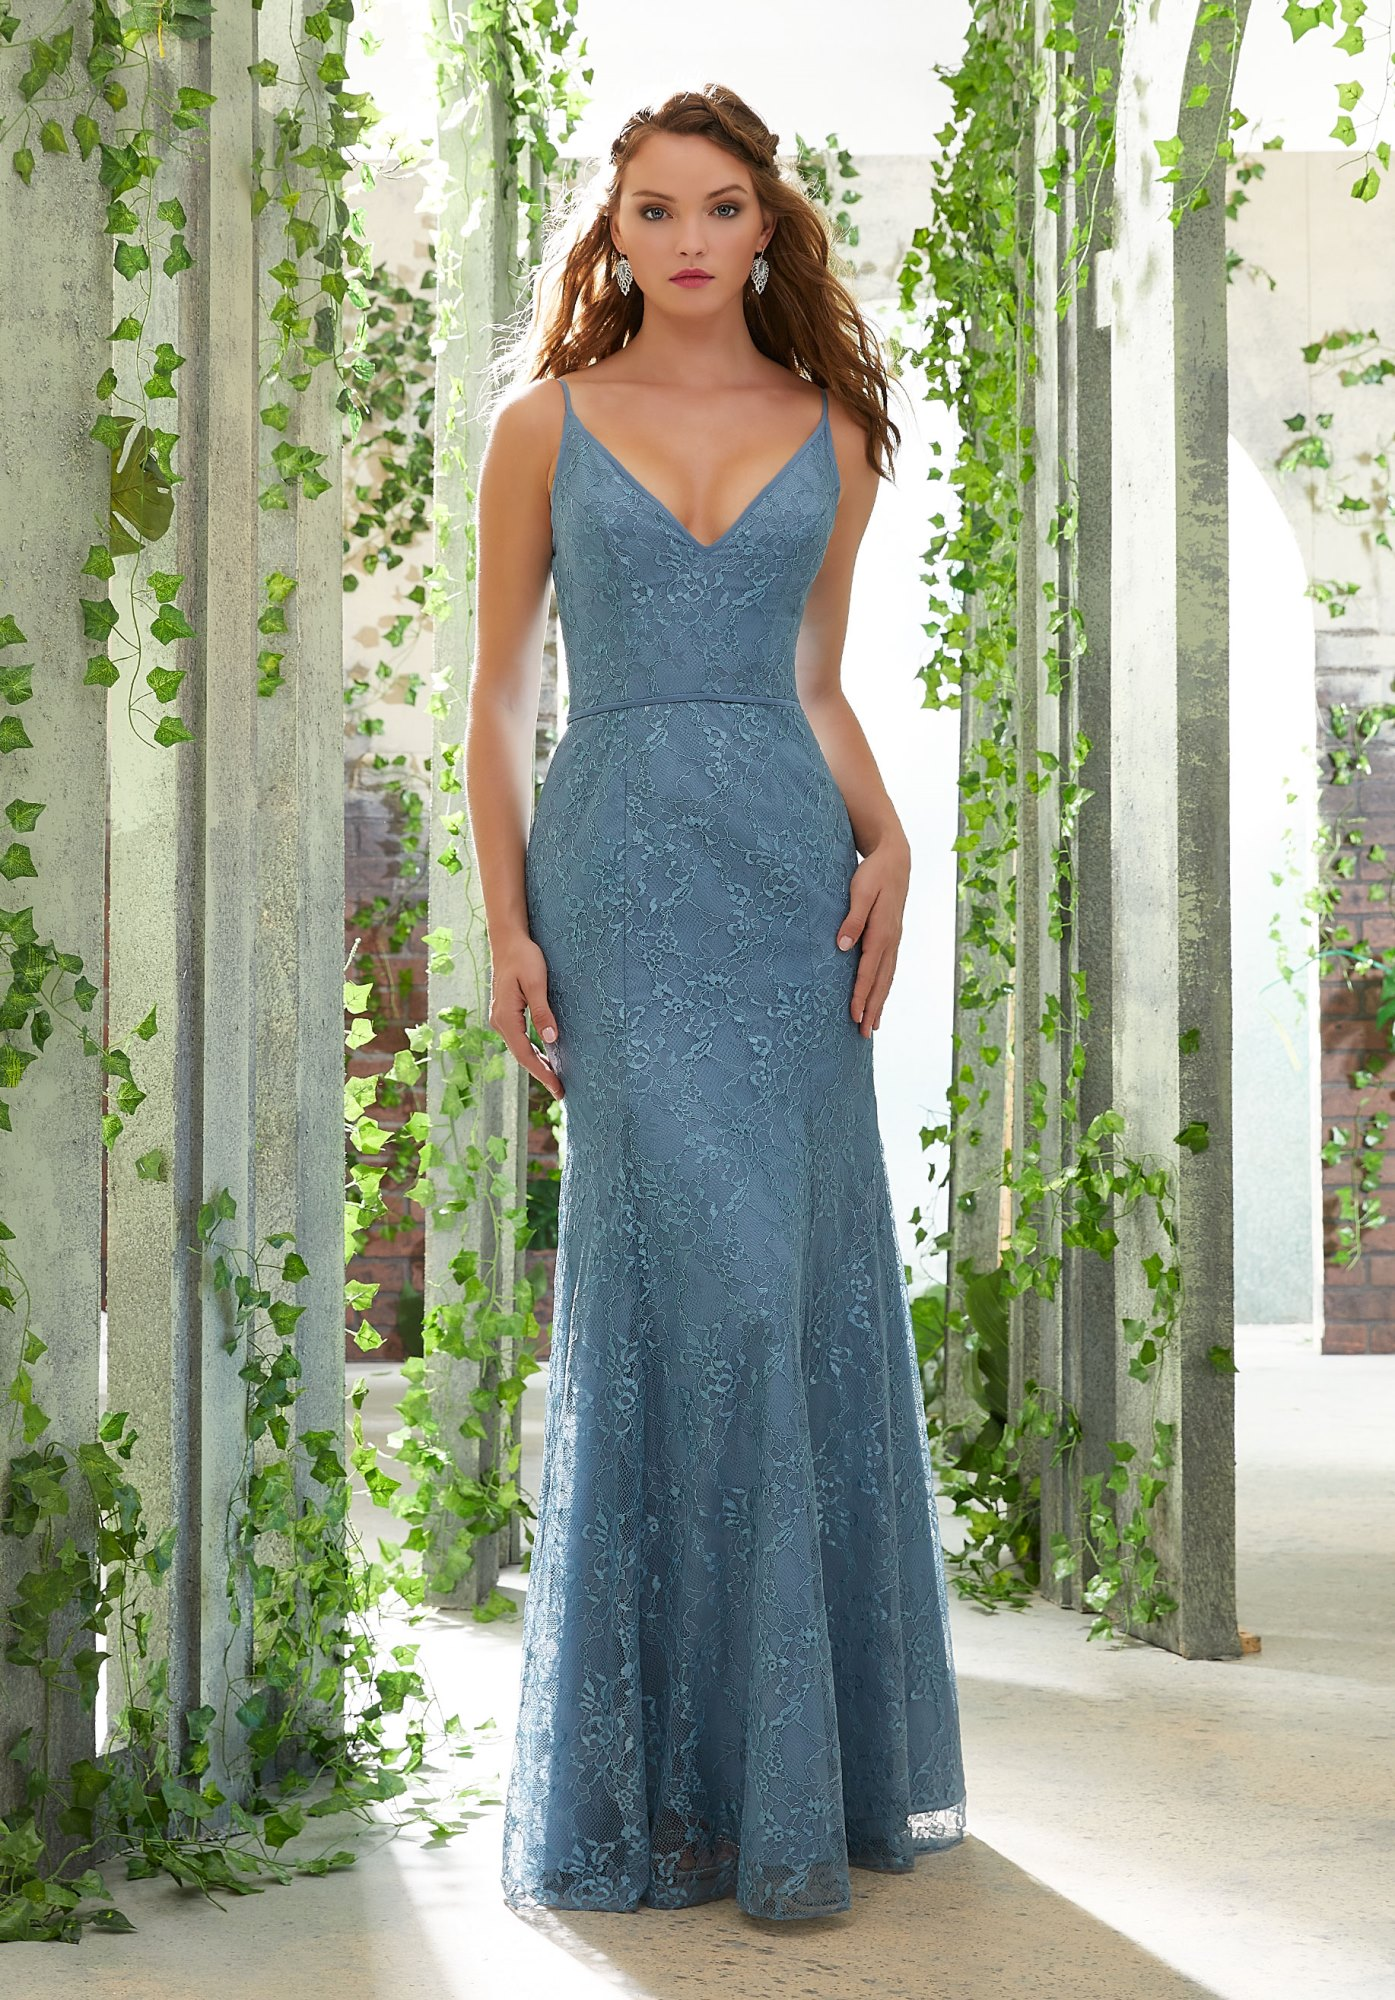 511ae45e53a0 Evening,Prom,Bridesmaids Dress by Mori Lee Mori Lee BRIDESMAIDS Spring 2019  Collection: 21610 - Chantilly Lace Bridesmaid Dress with Deep-V Neckline